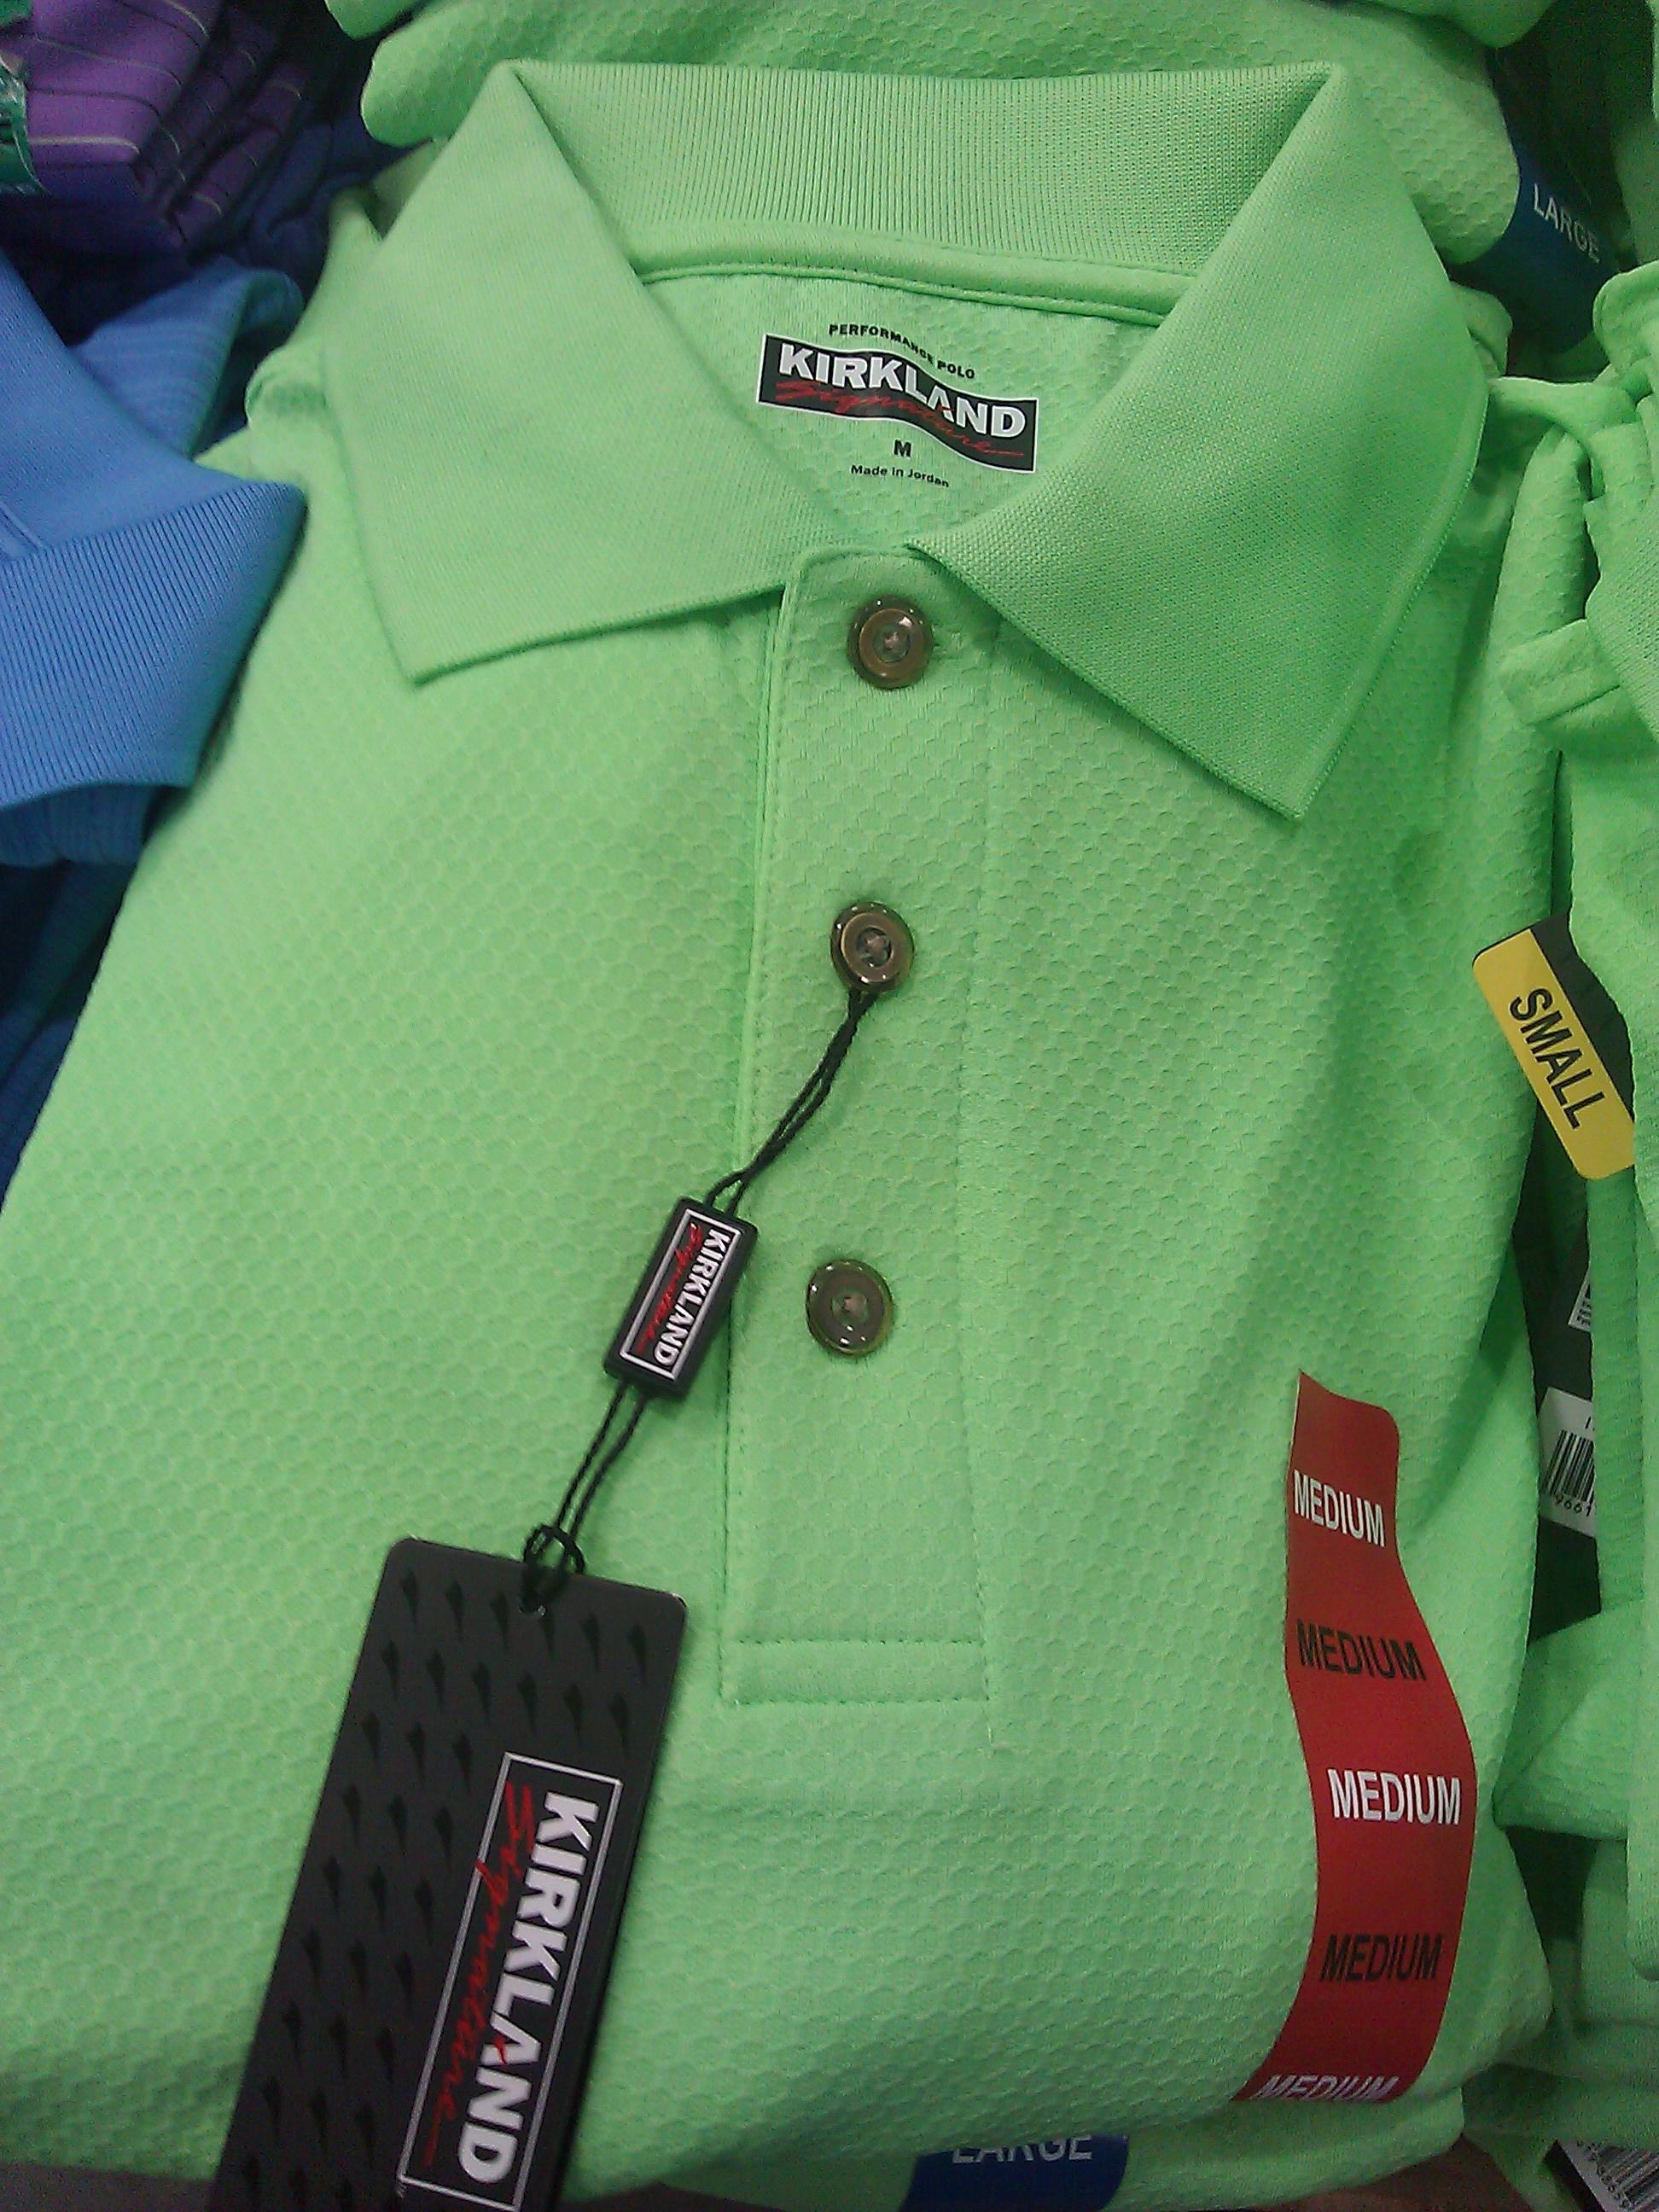 Kirkland Signature Golf Polo Shirts Costco